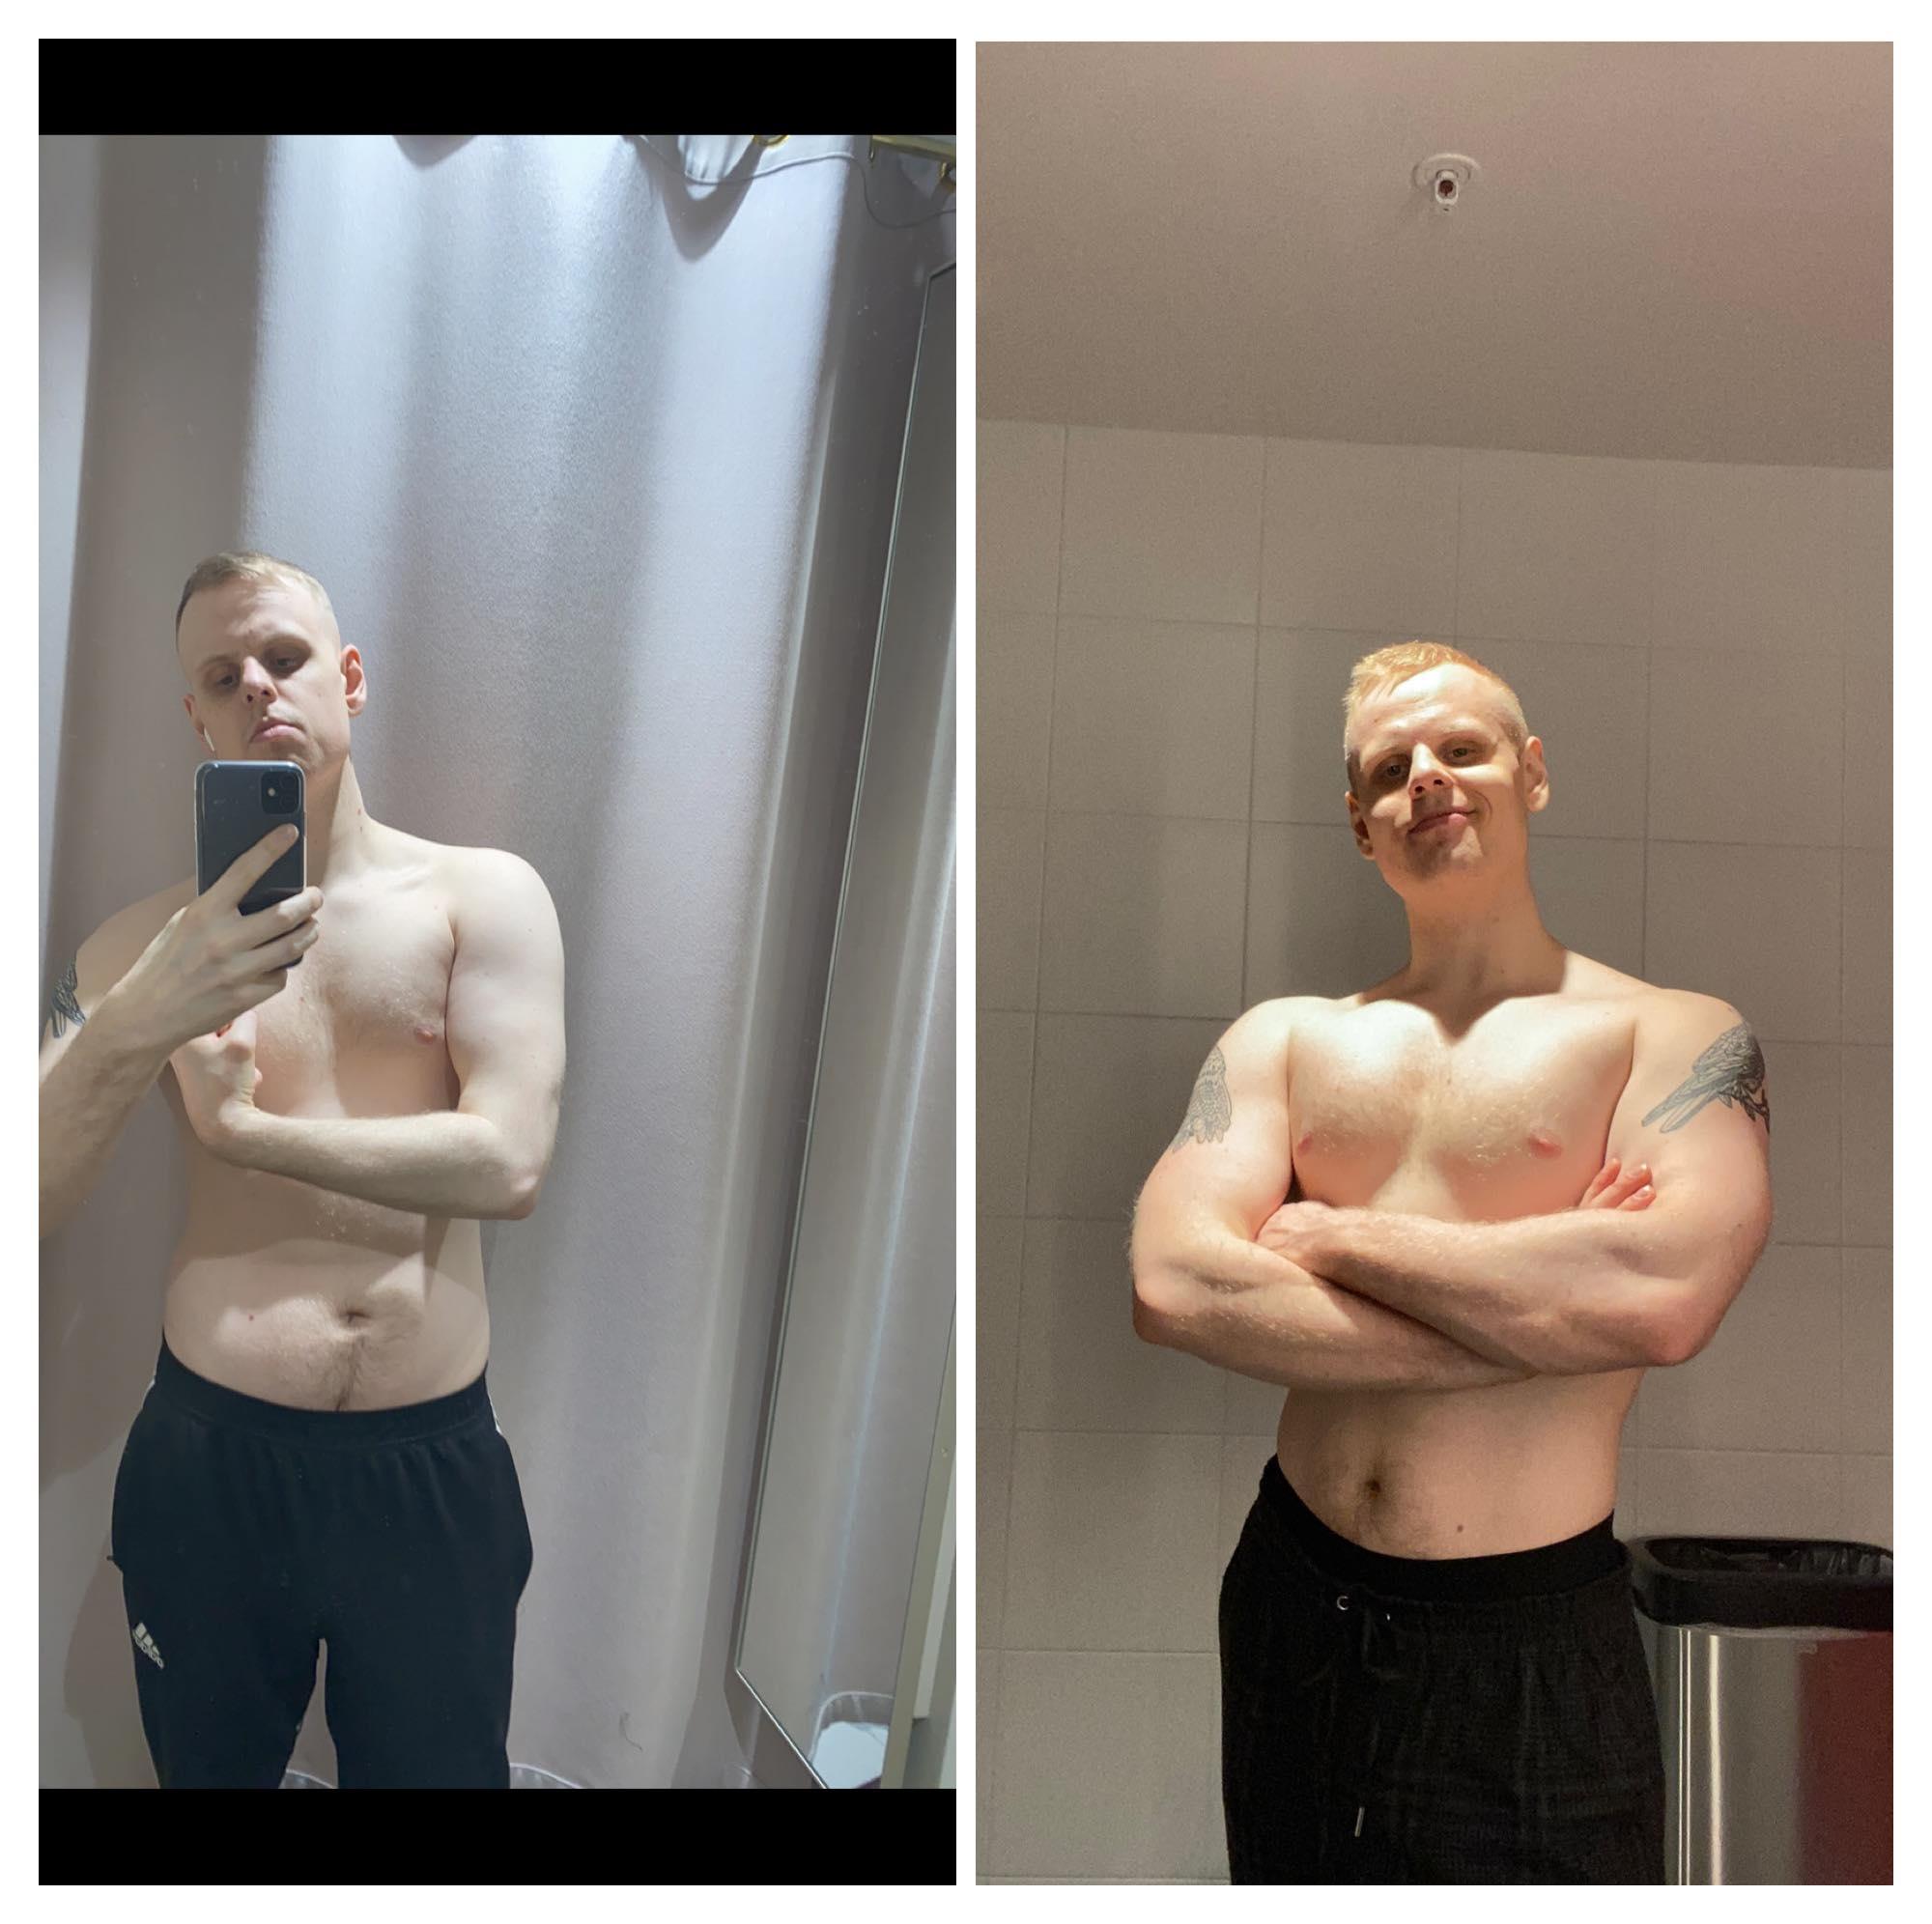 Progress Pics of 10 lbs Weight Gain 5 foot 11 Male 167 lbs to 177 lbs